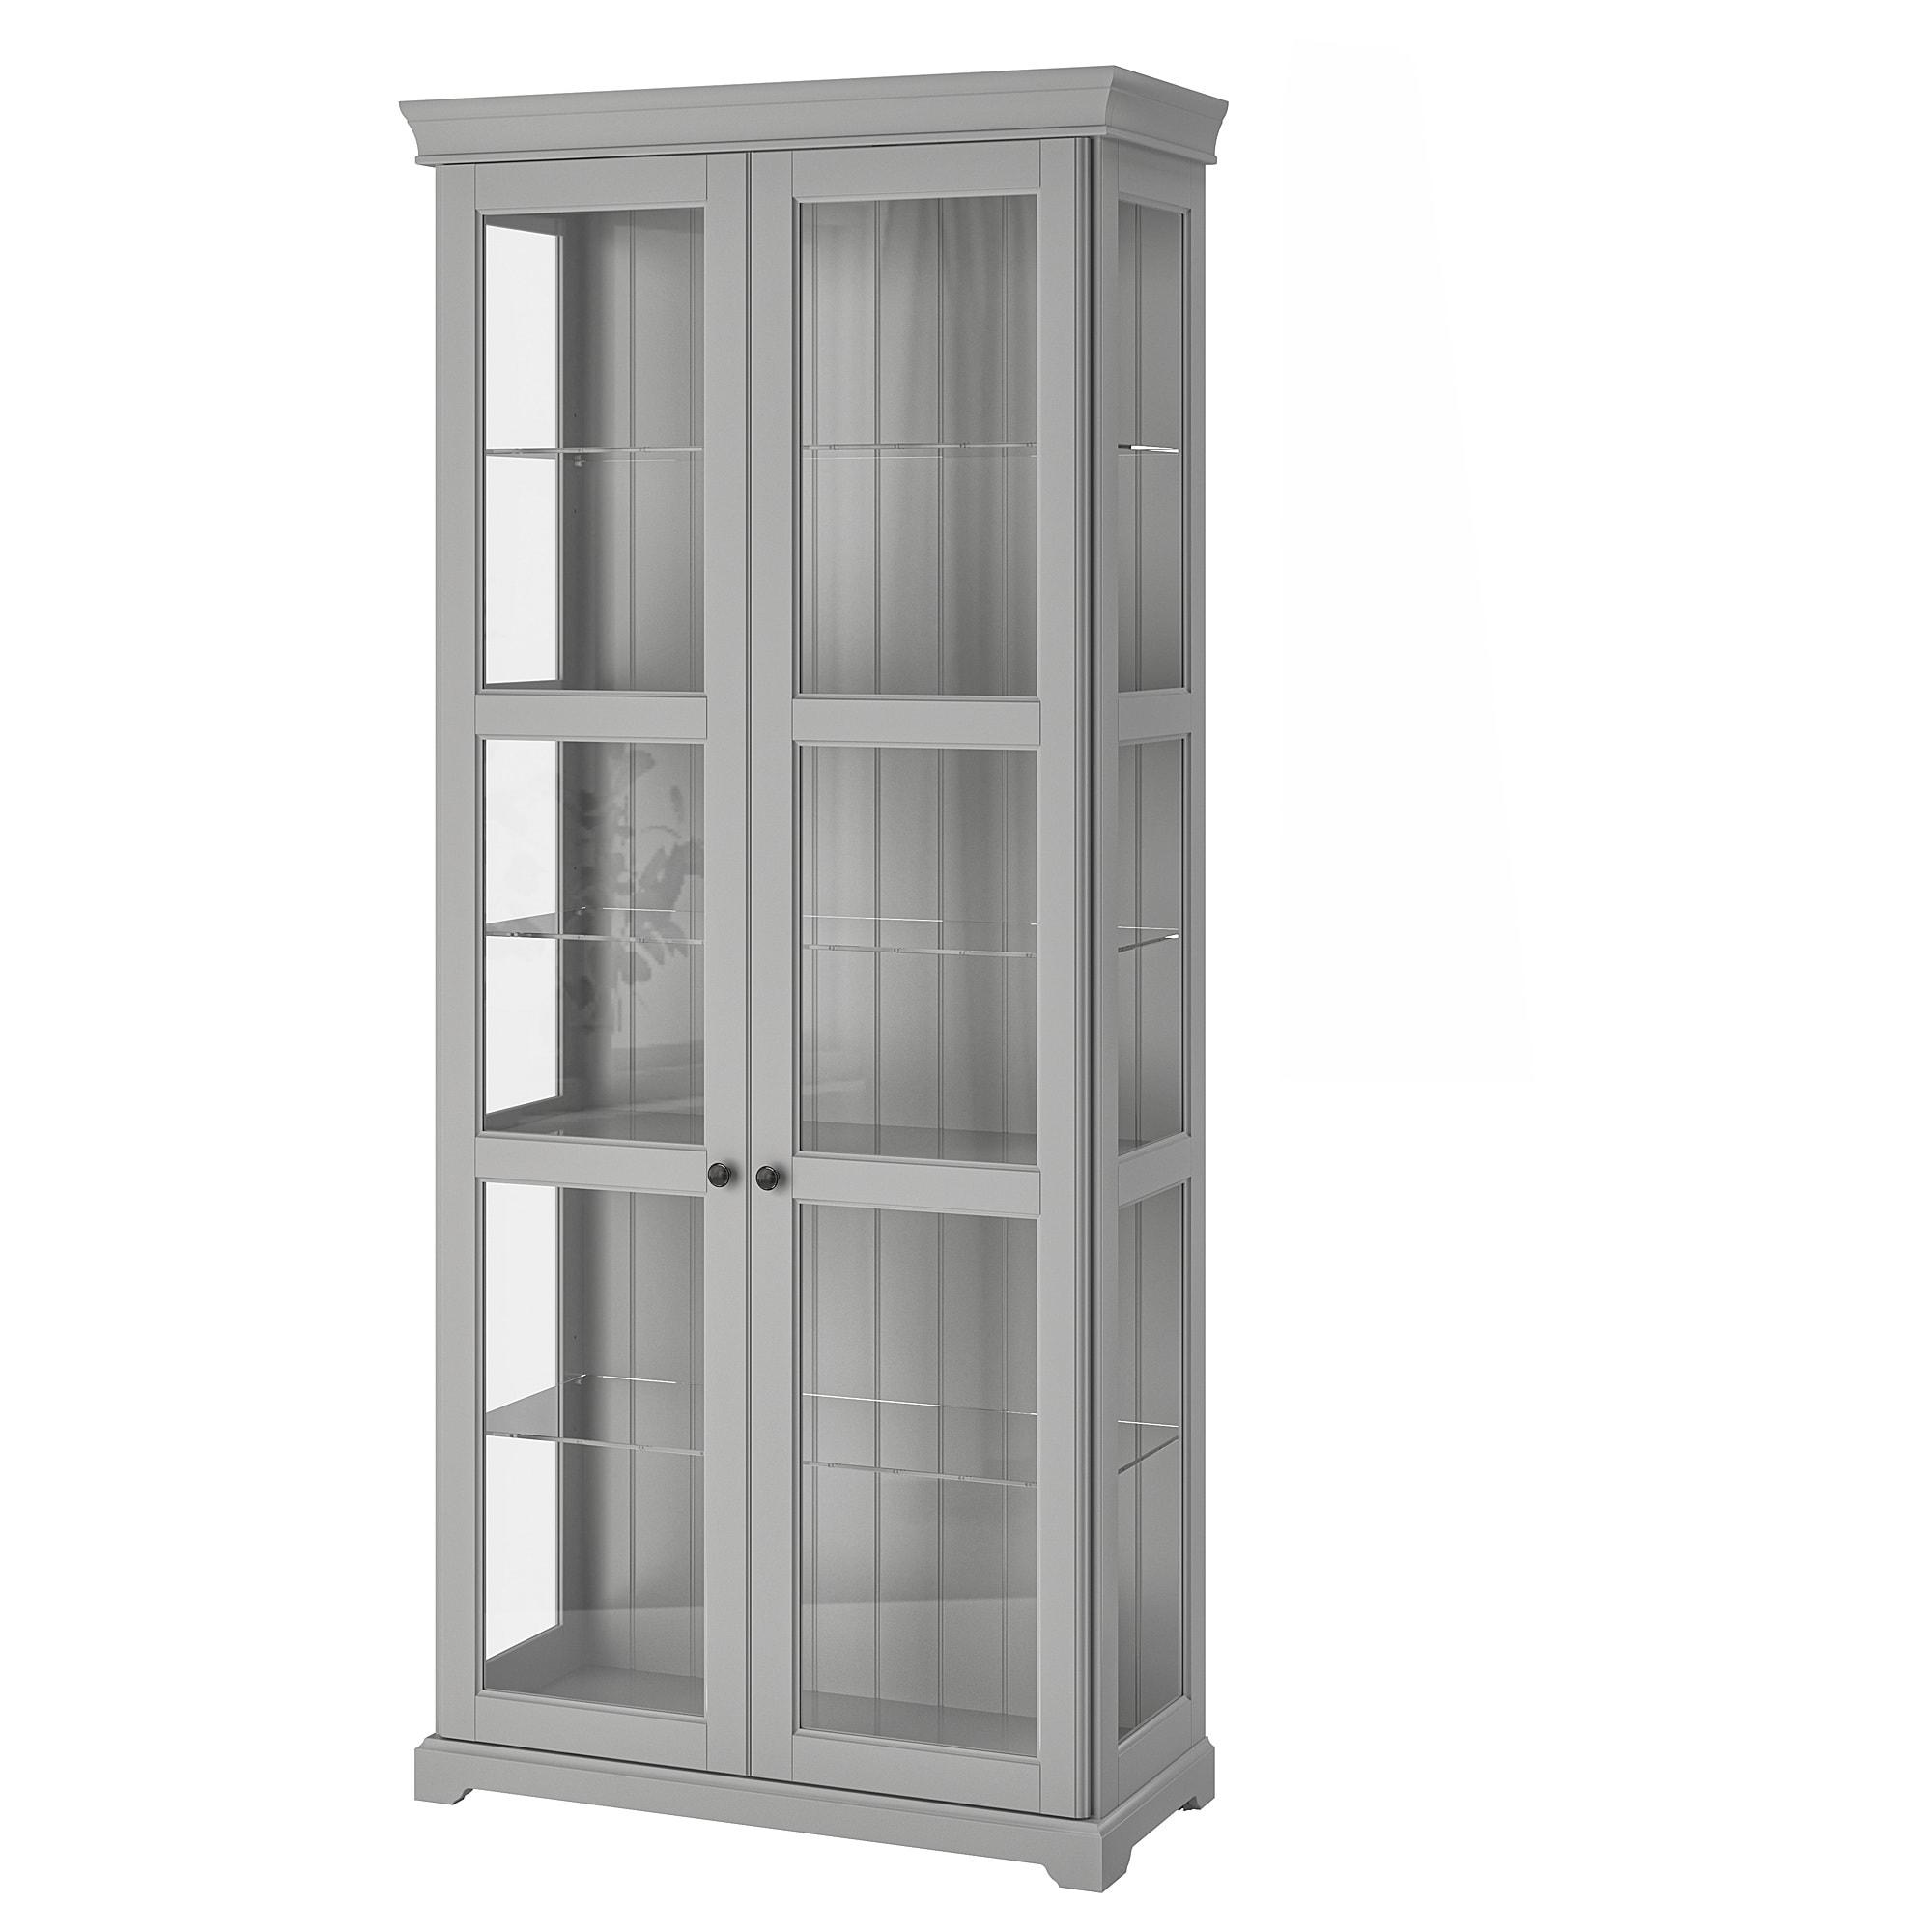 Ikea Us Furniture And Home Furnishings Glass Cabinet Doors Cabinet Decor Liatorp